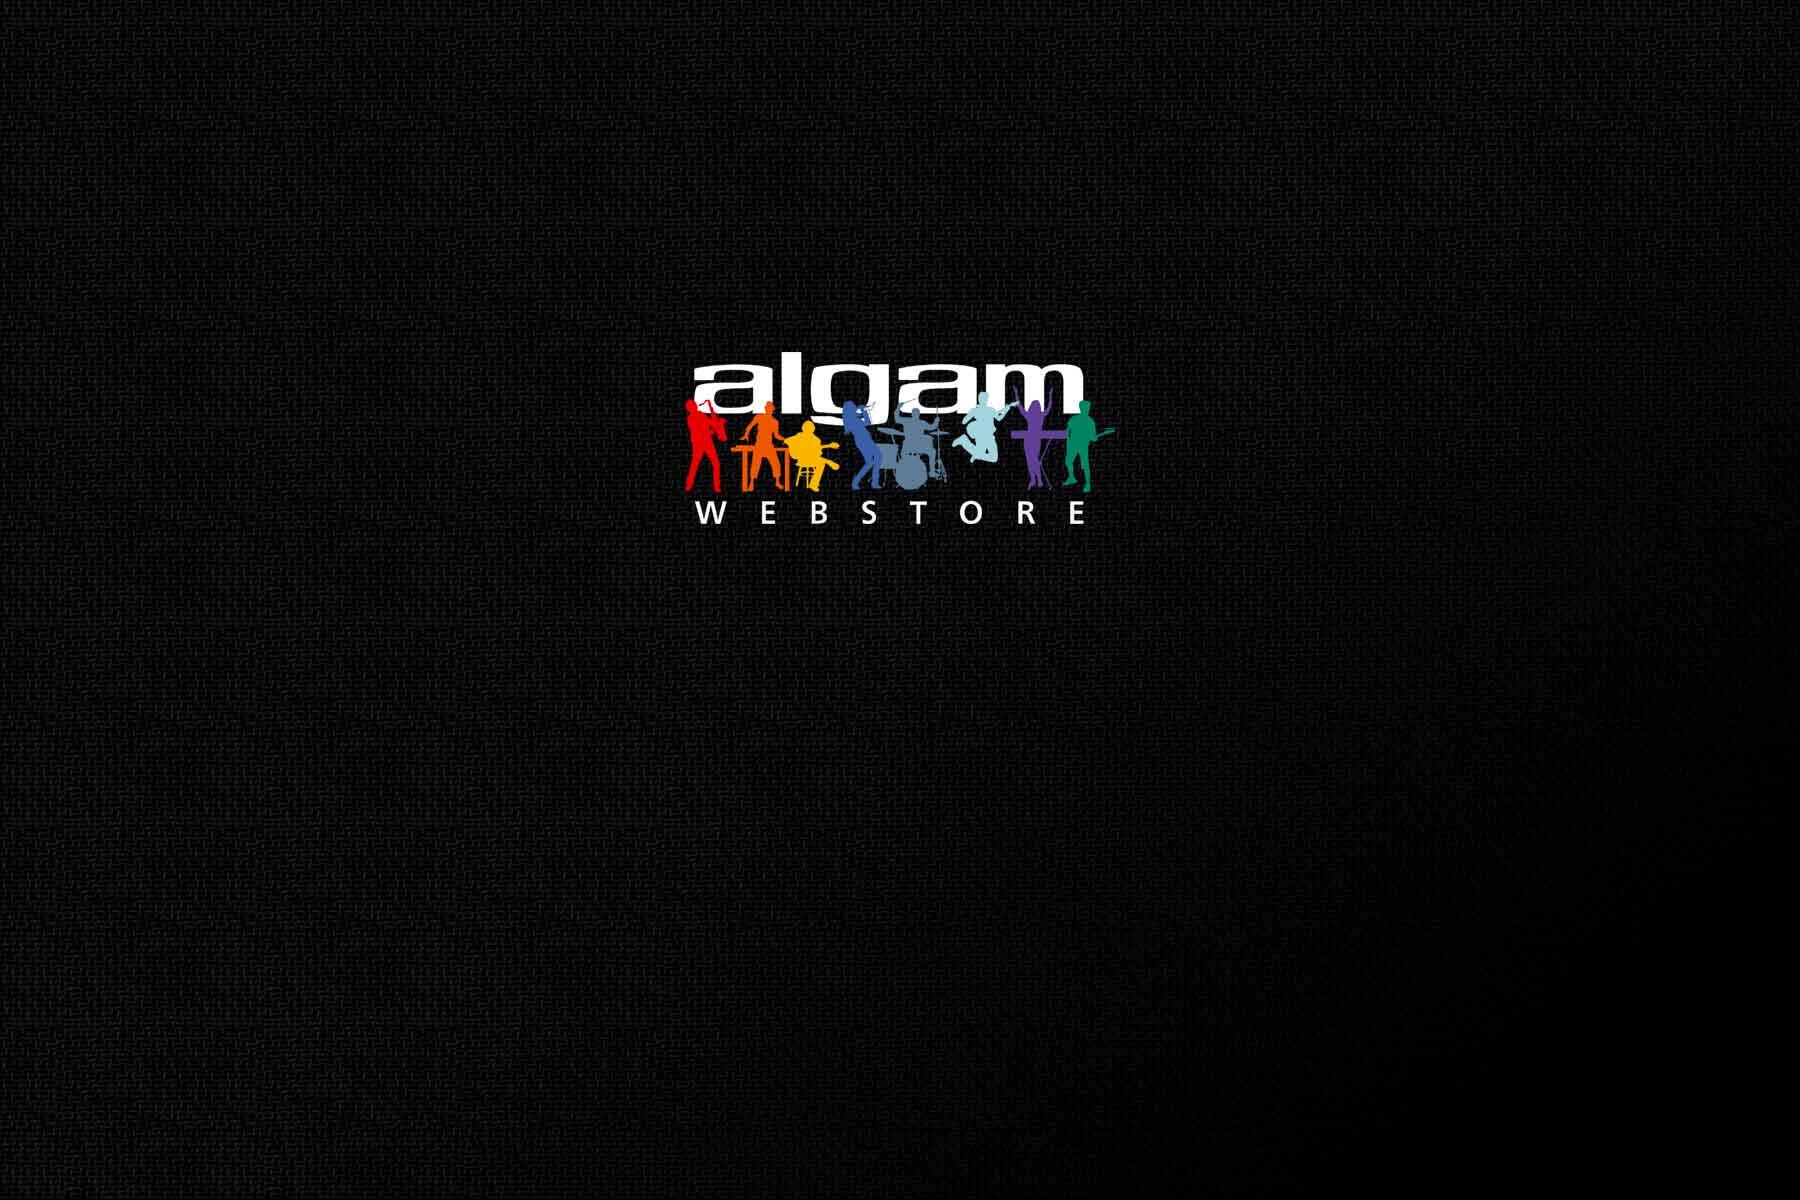 Algam Webstore - Vente d'instruments de musique